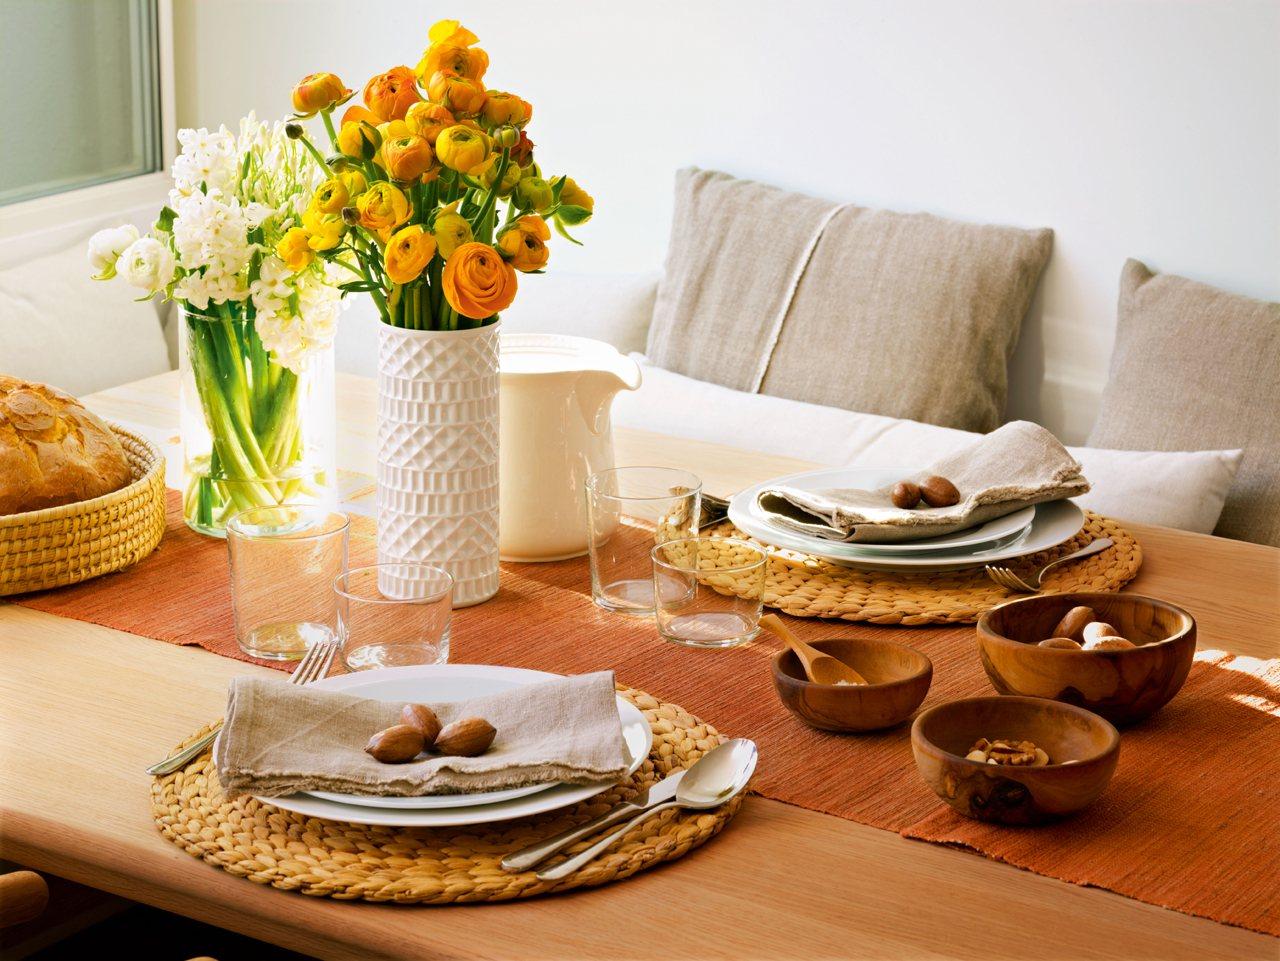 Una cocina c lida donde reunir a la familia - Caminos de mesa ikea ...